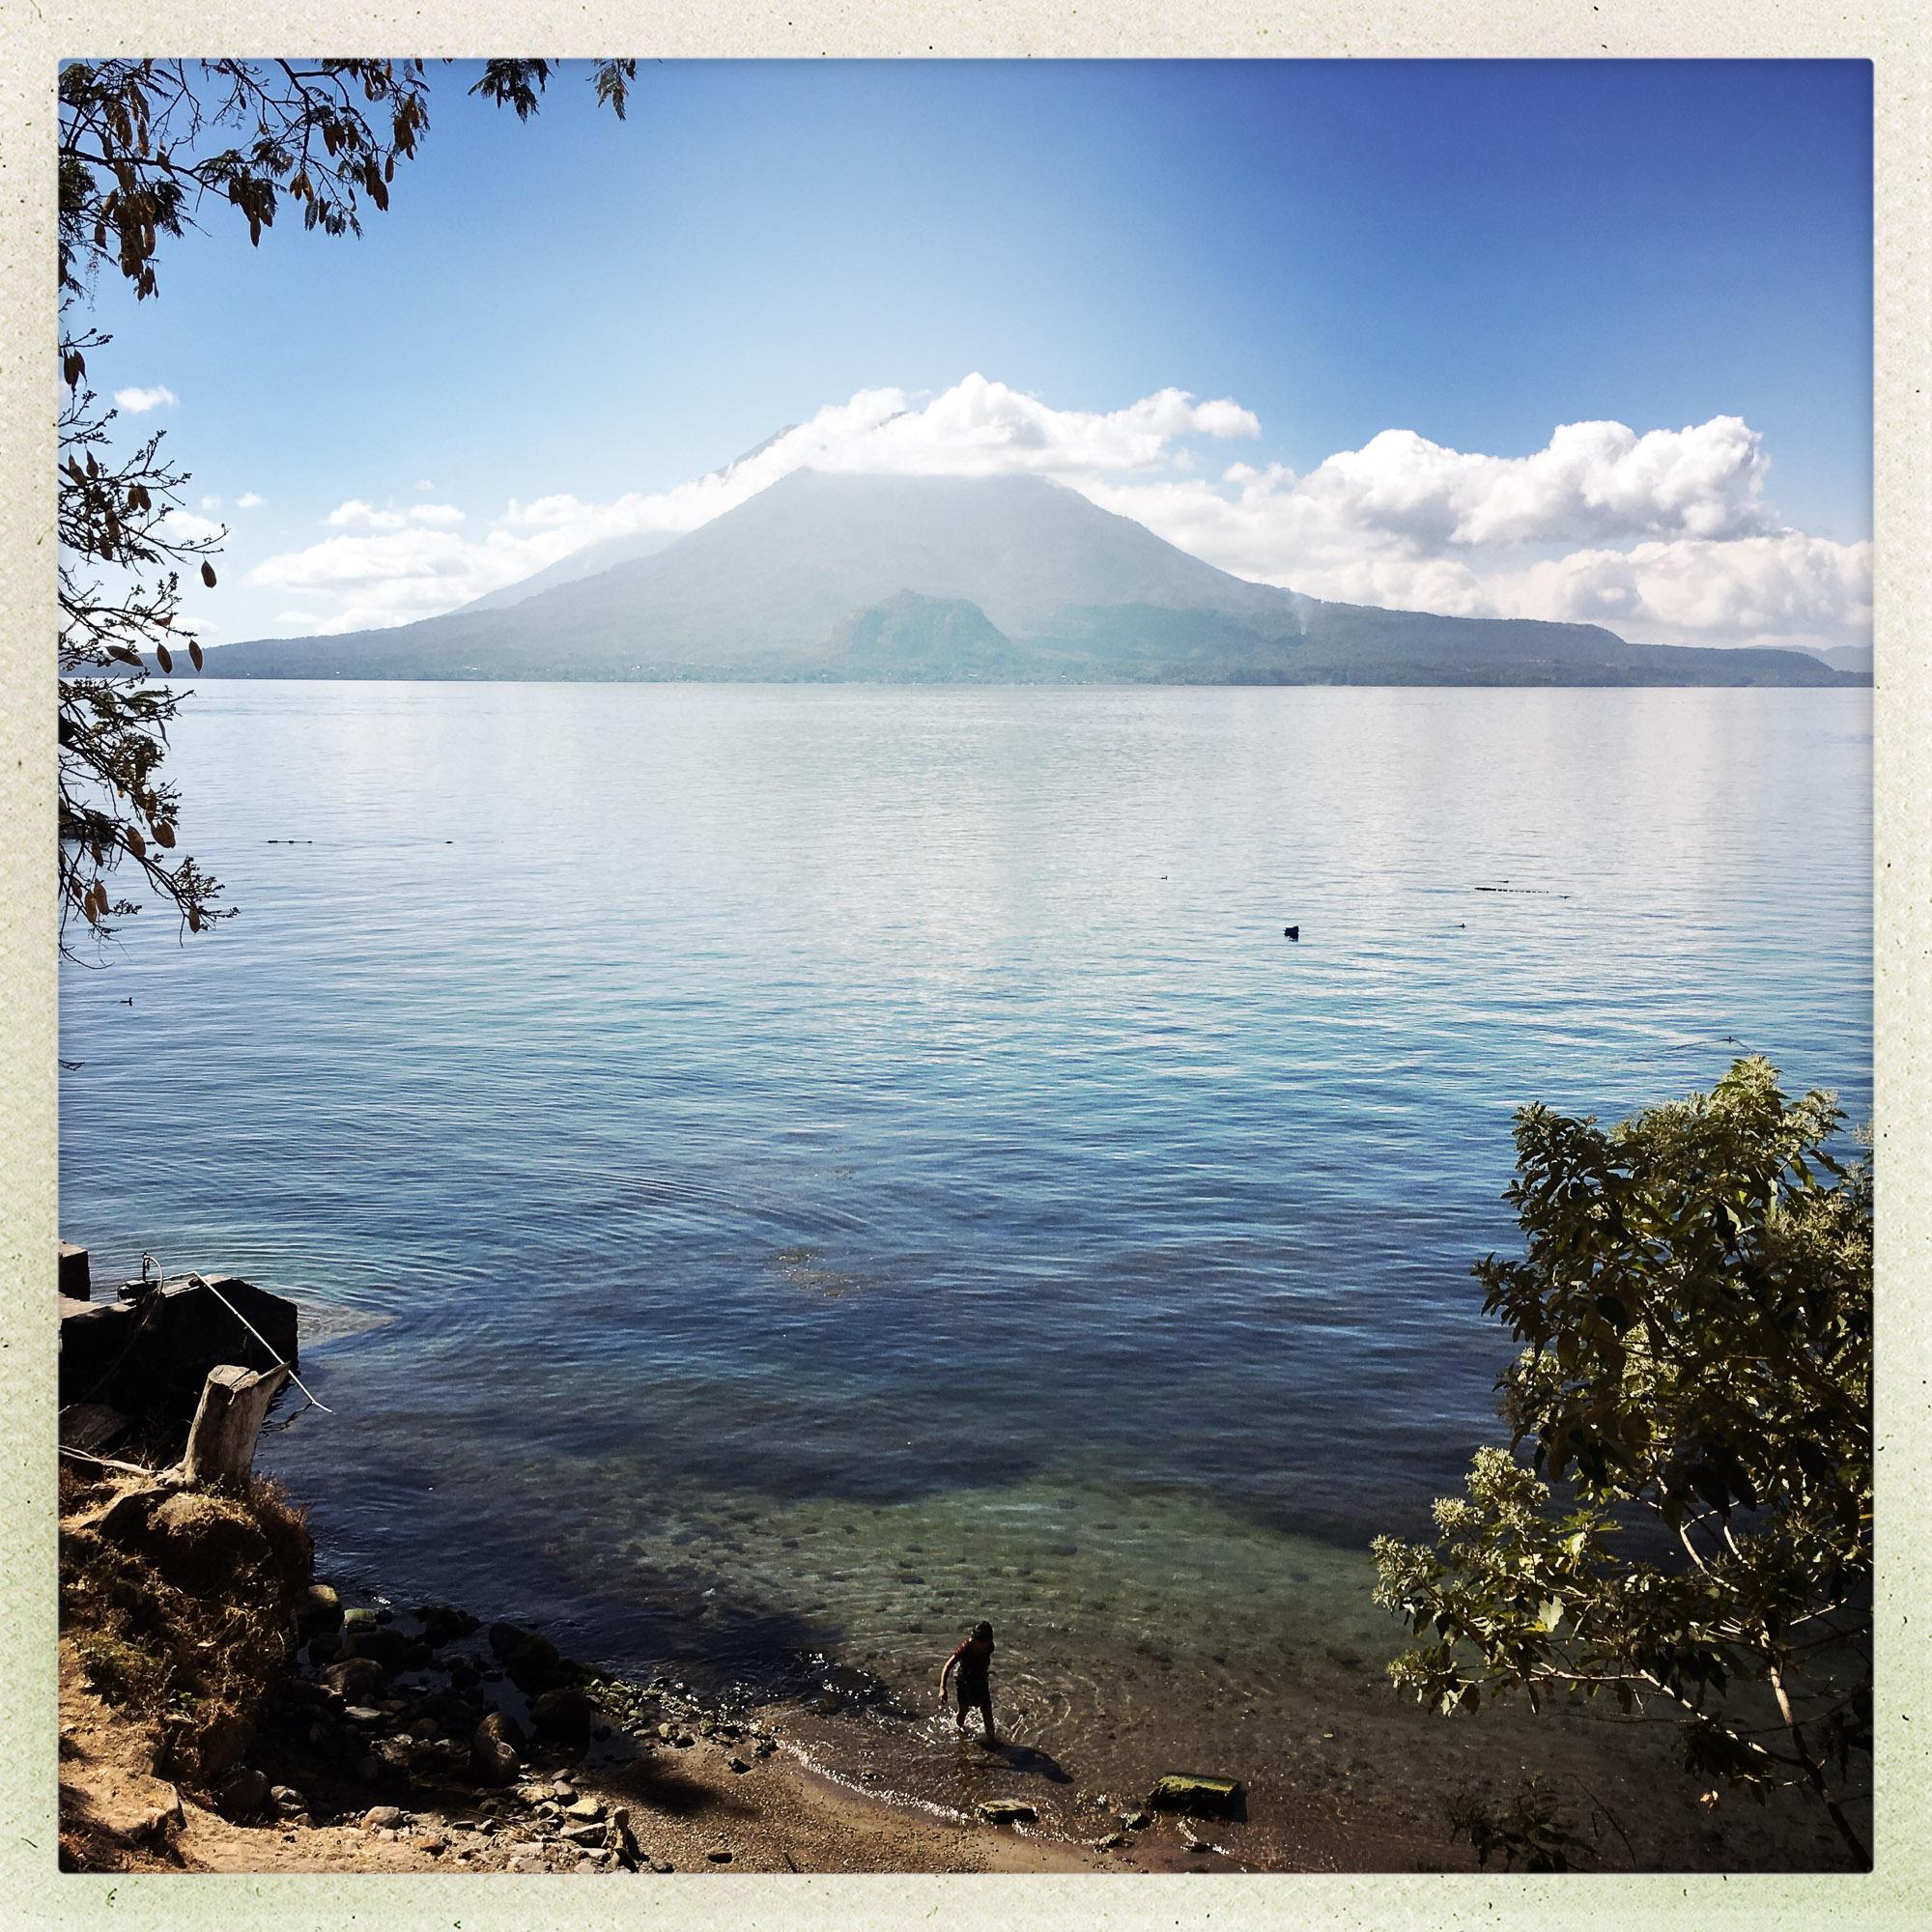 guatemala-christine-han-photography-145.jpg